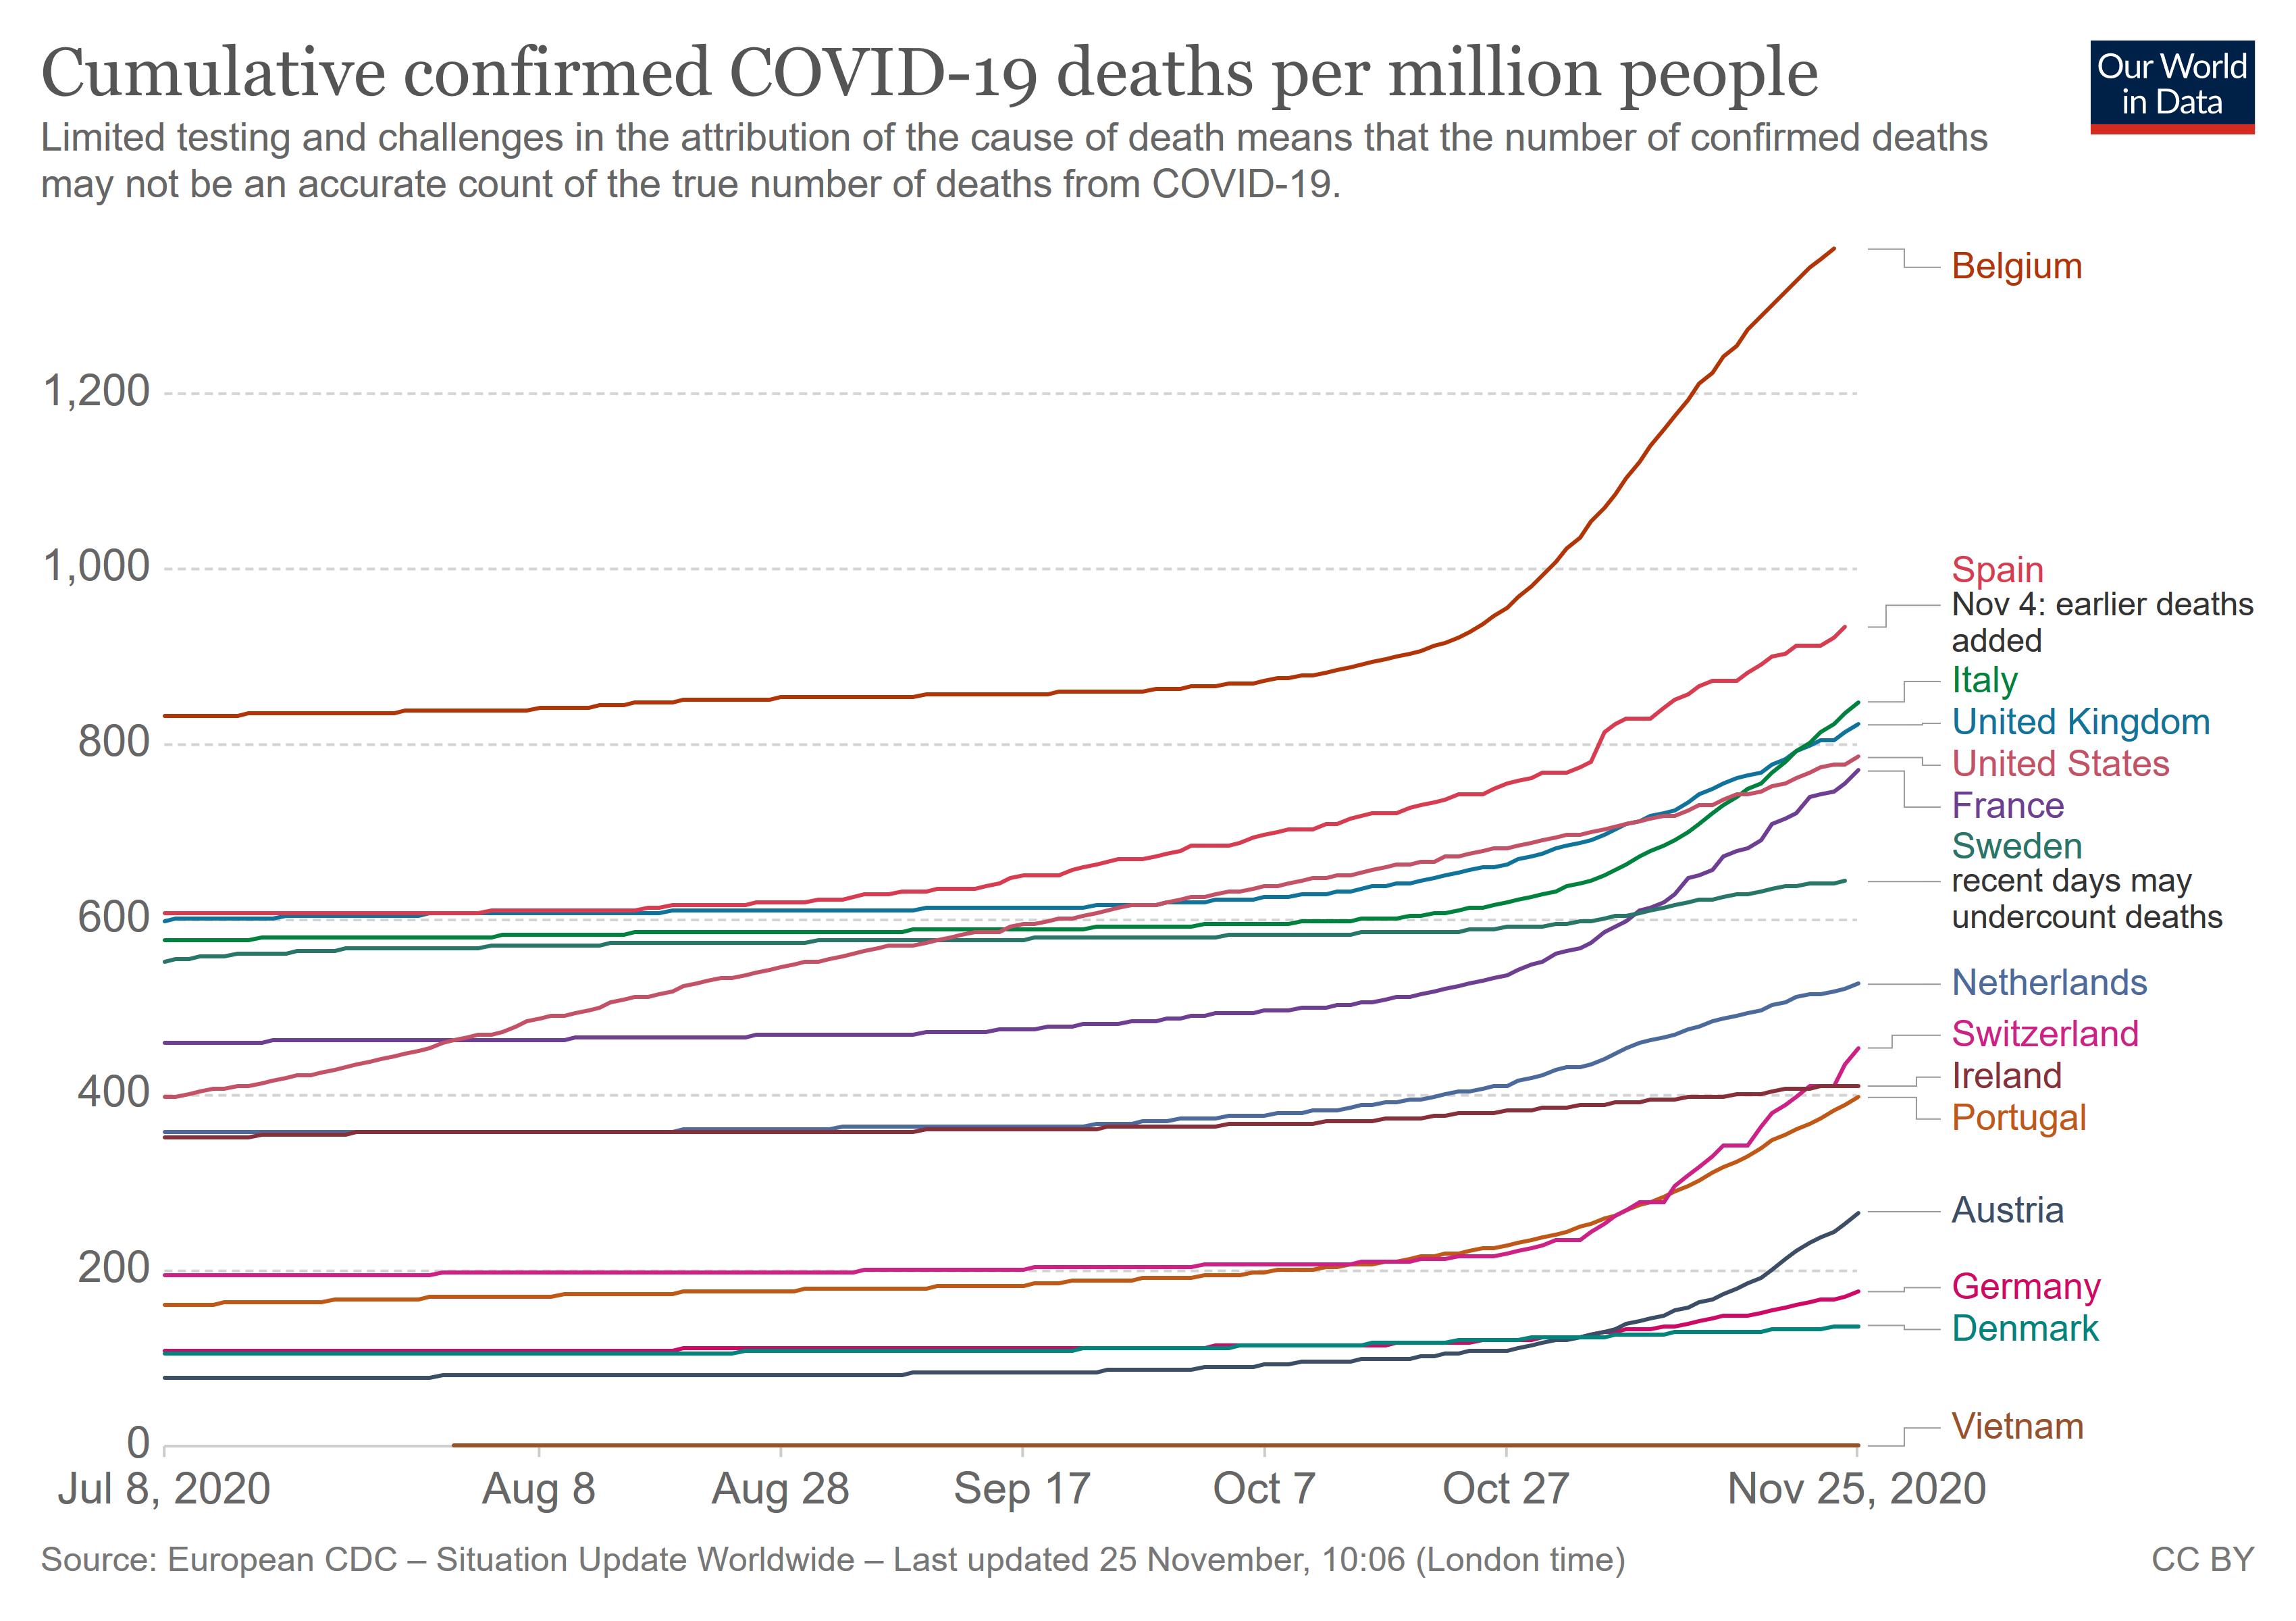 Cumulative confirmed COVID-19 deaths per million people